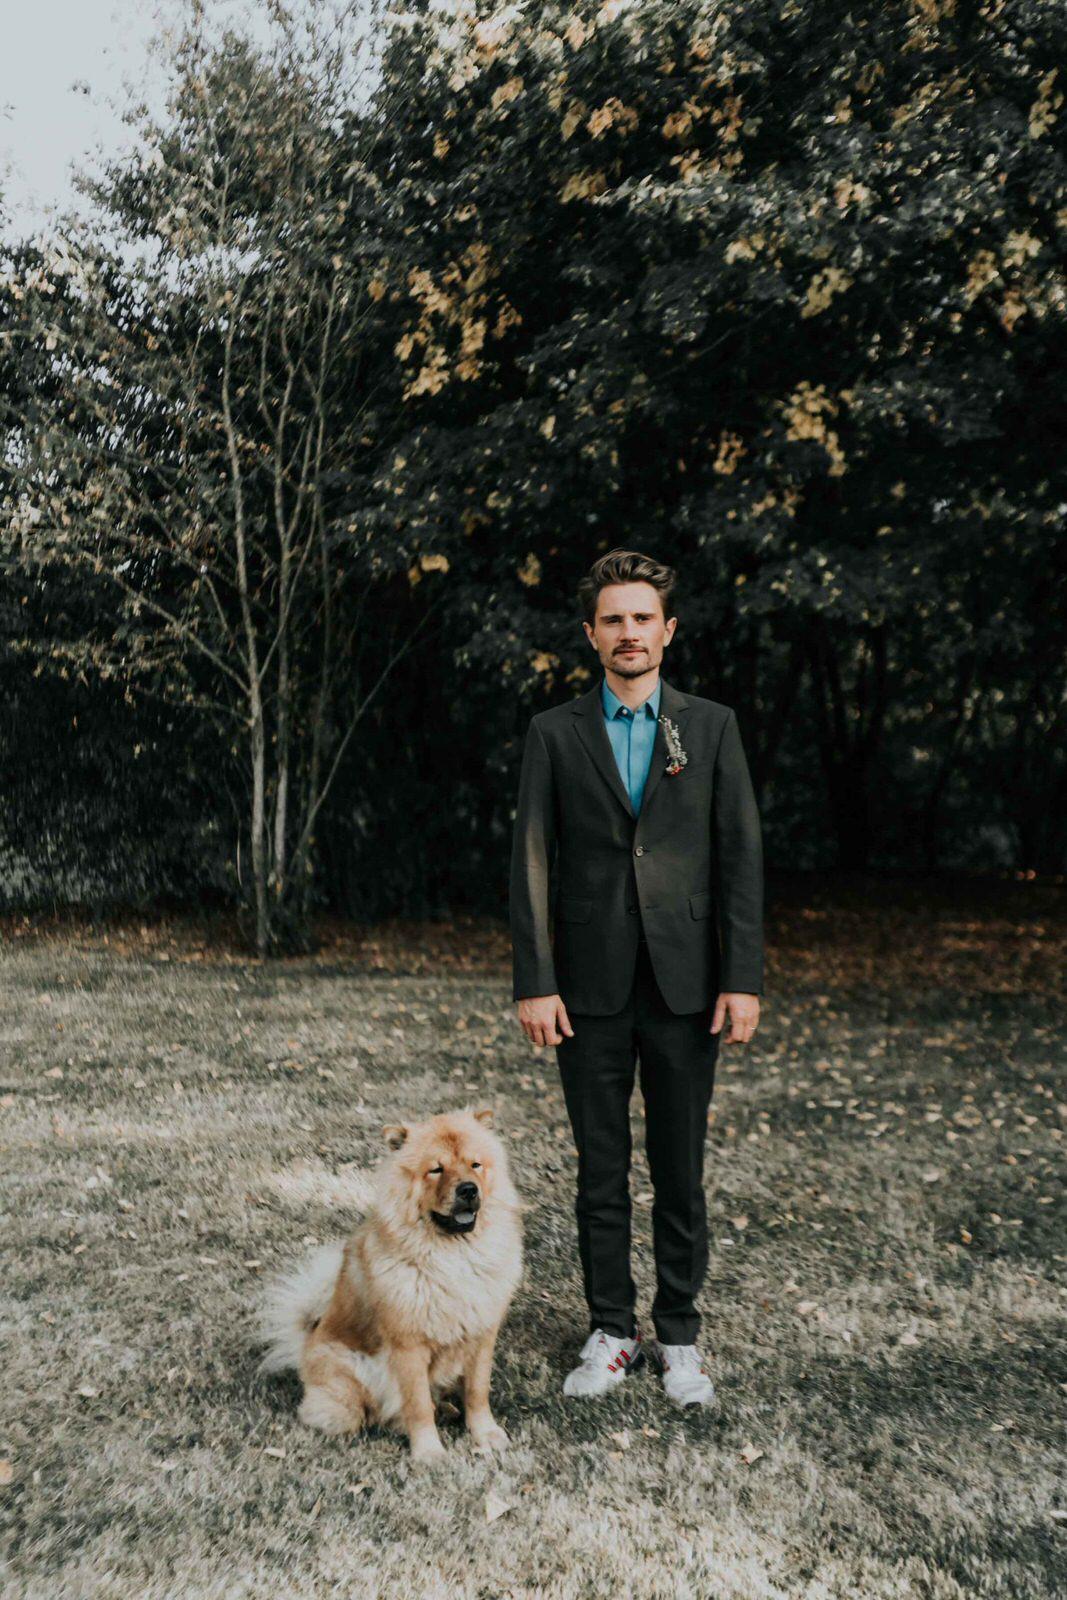 SFOREVER-MARIAGE-PHOTOGRAPHE-BELGIQUE-409-scaled-2